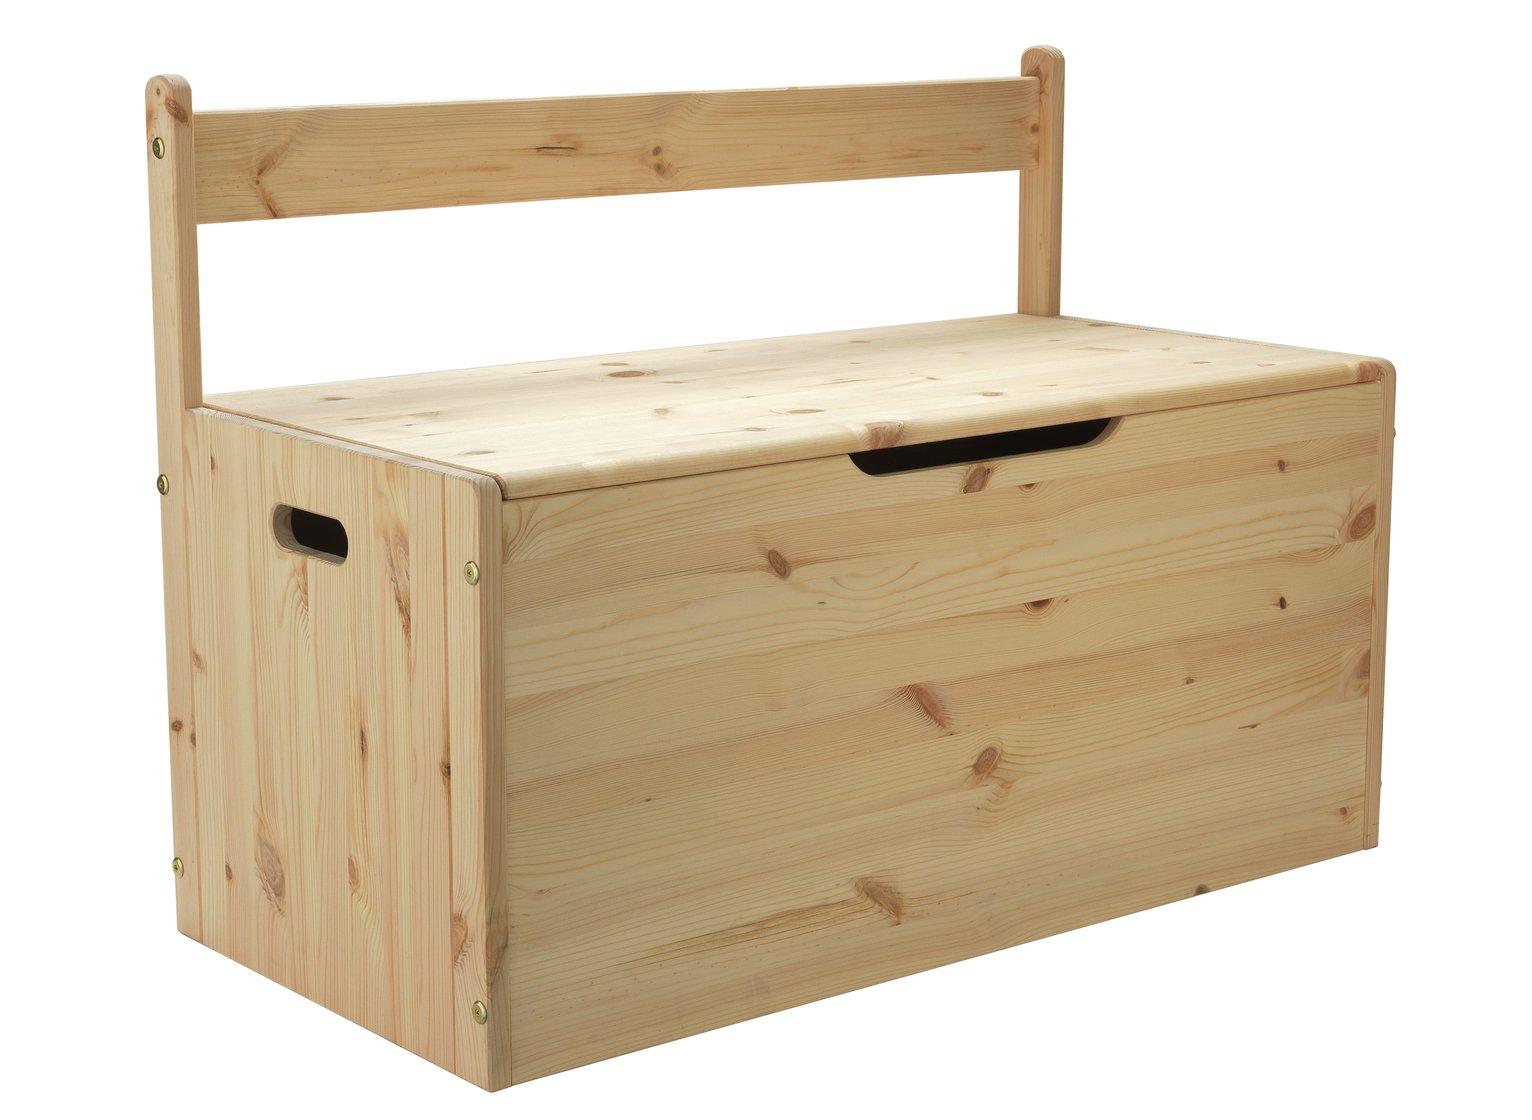 Argos Home Scandinavia Pine Kids Extra Large Toy Box